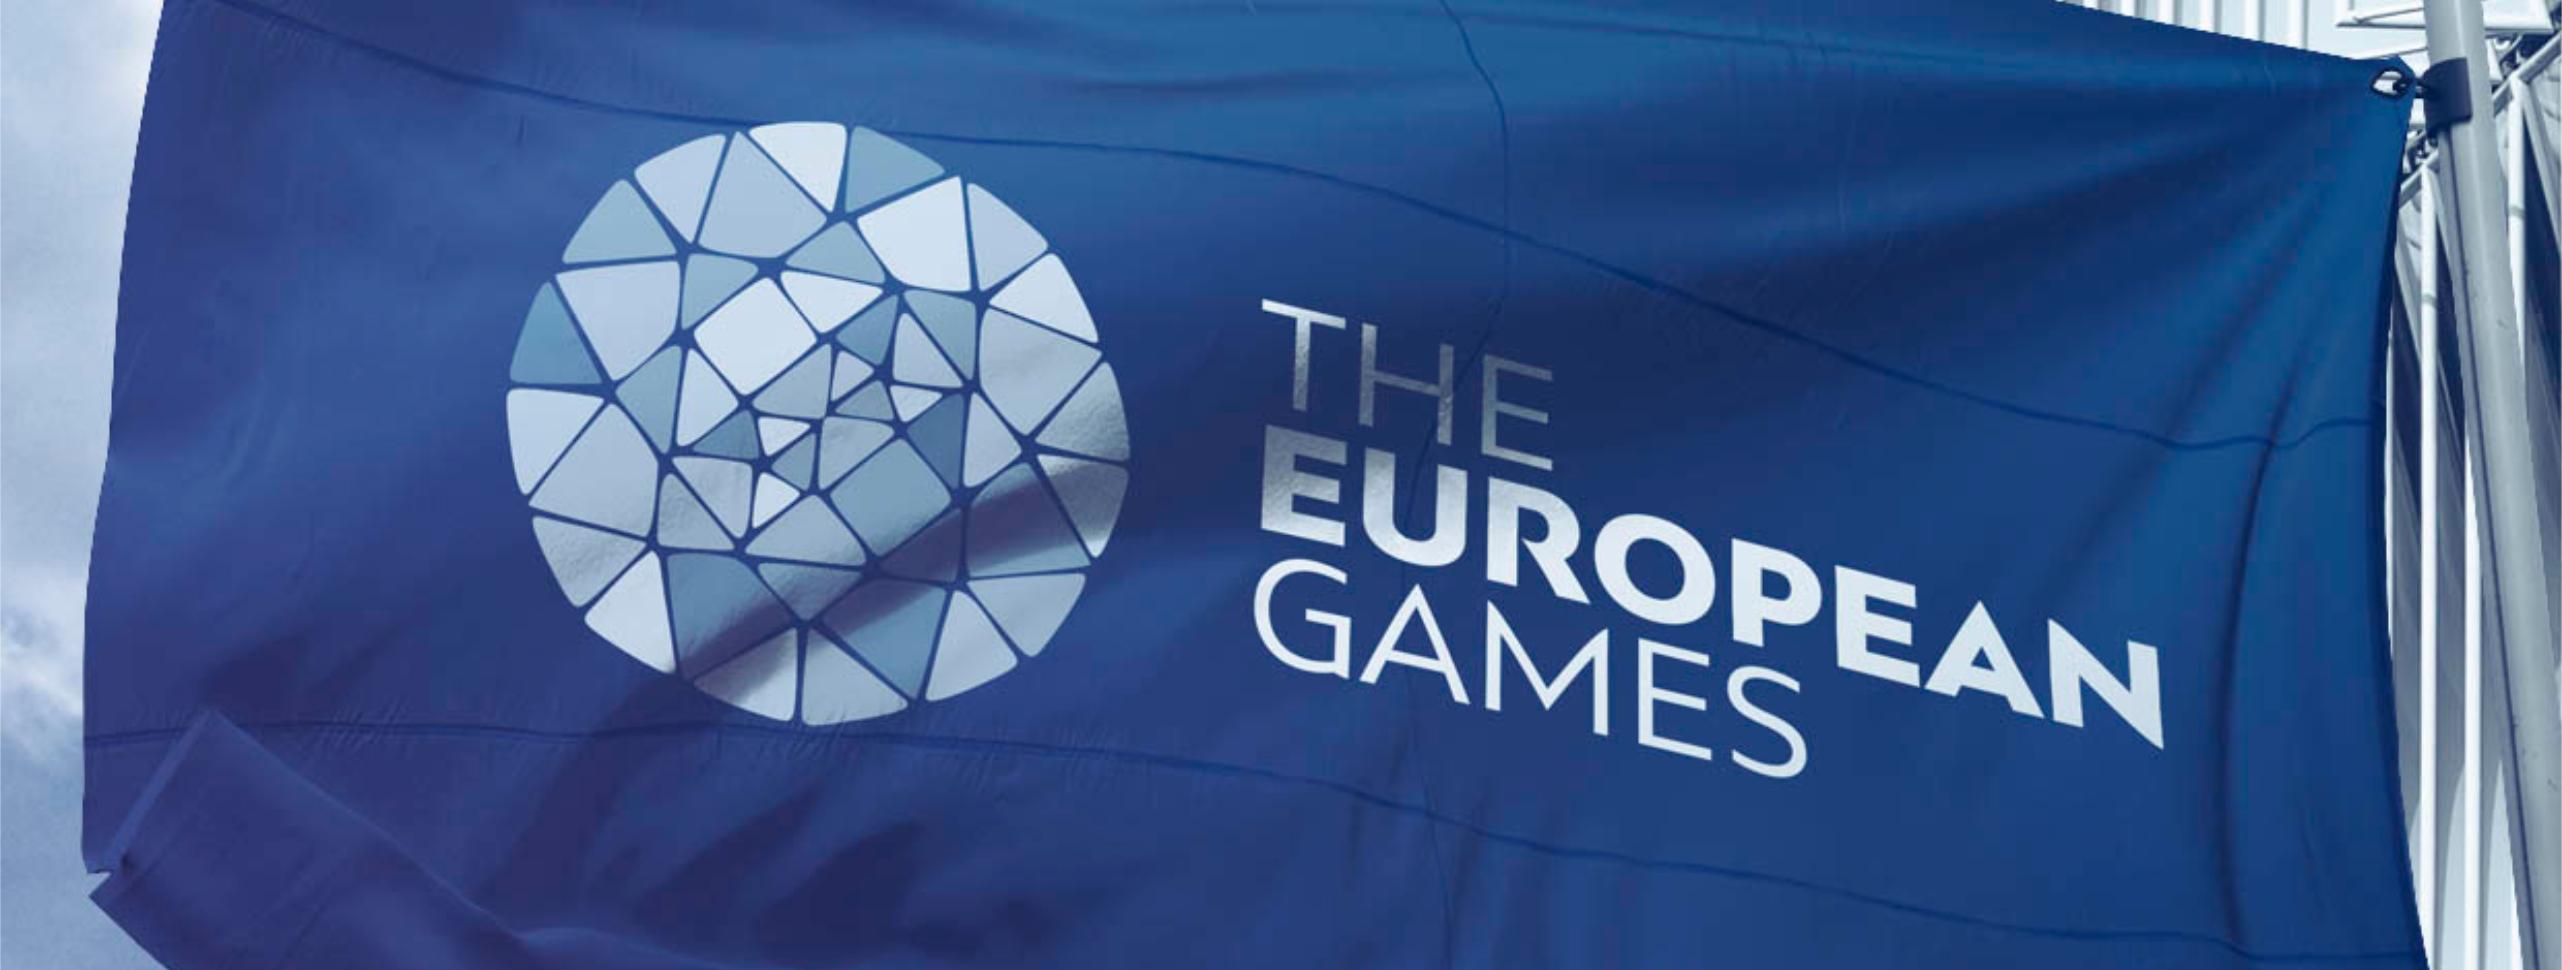 SPORT CLIMBING ADDED TO THE EUROPEAN GAMES KRAKOW 2023 PROGRAMME